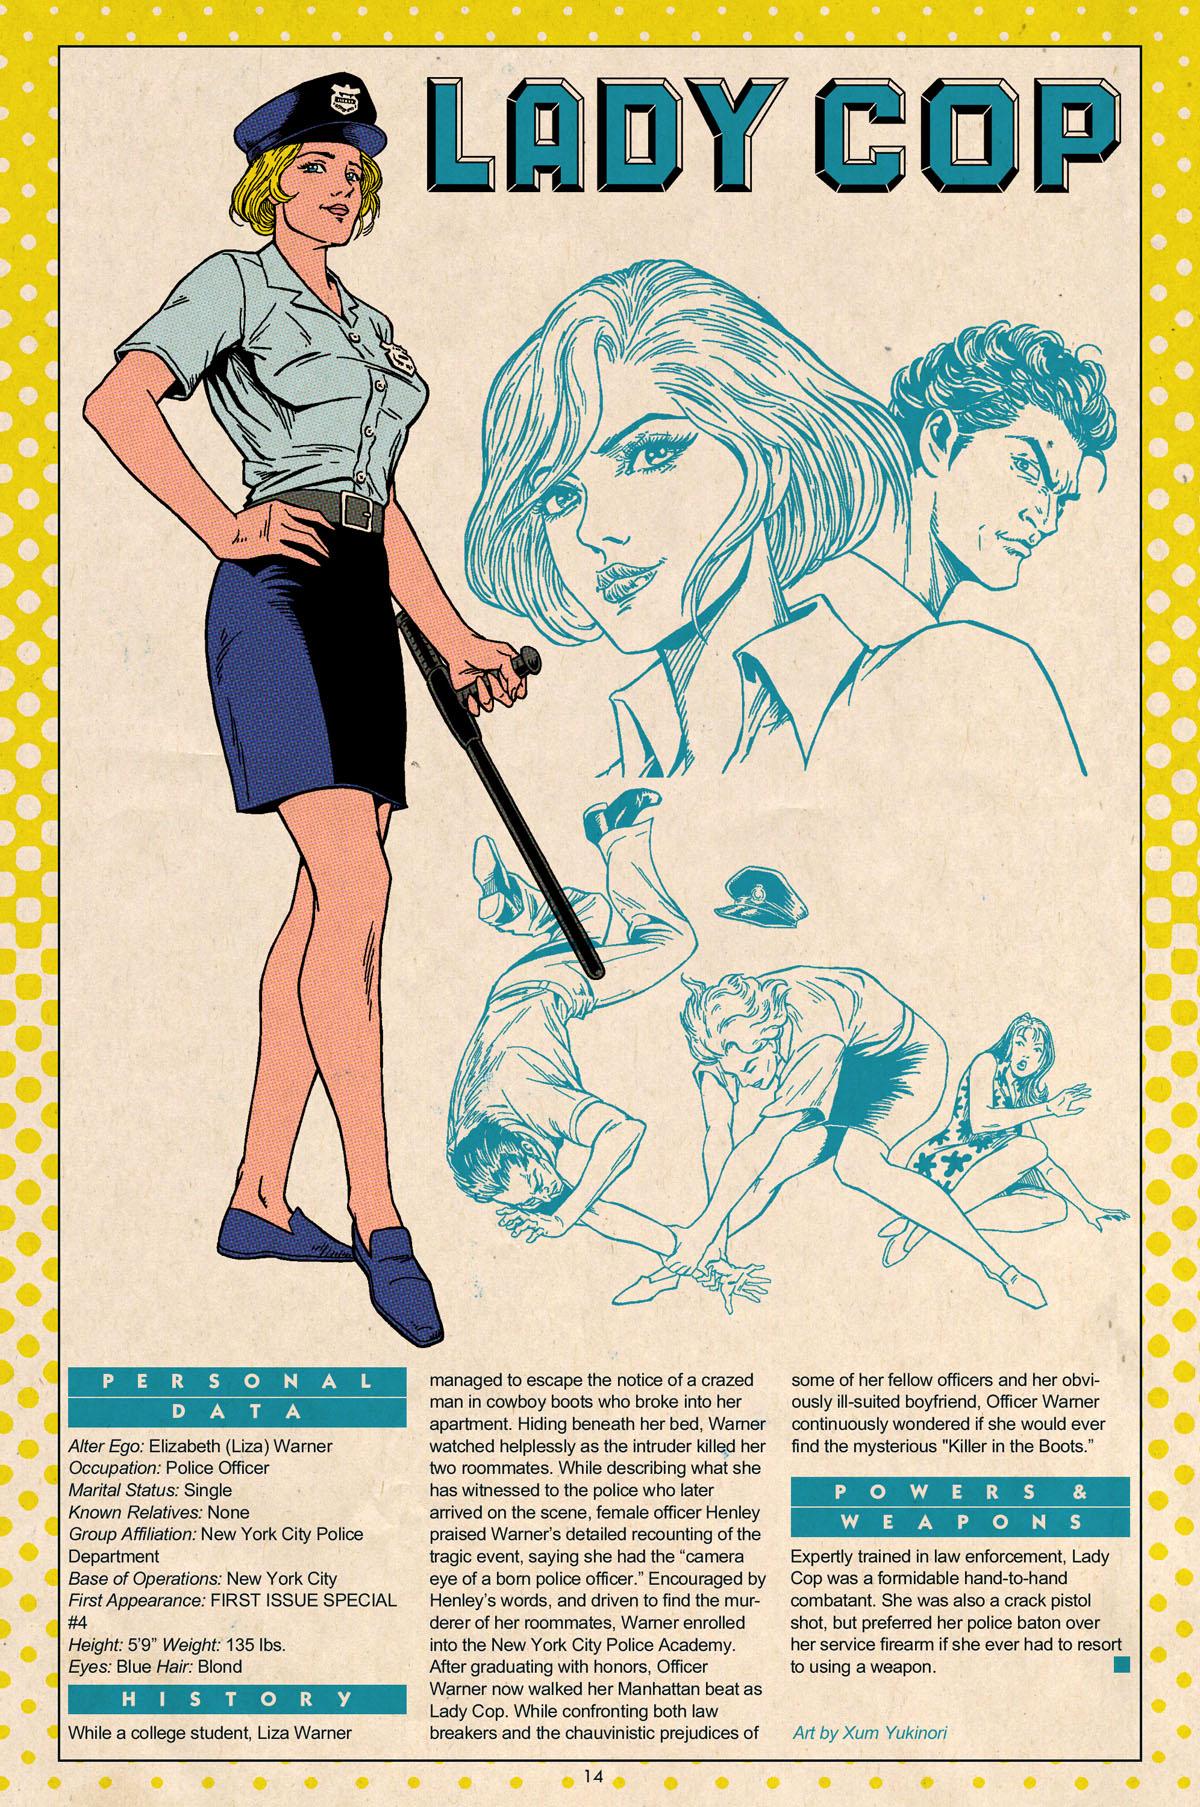 Xum Yukinori's Who's Who Lady Cop